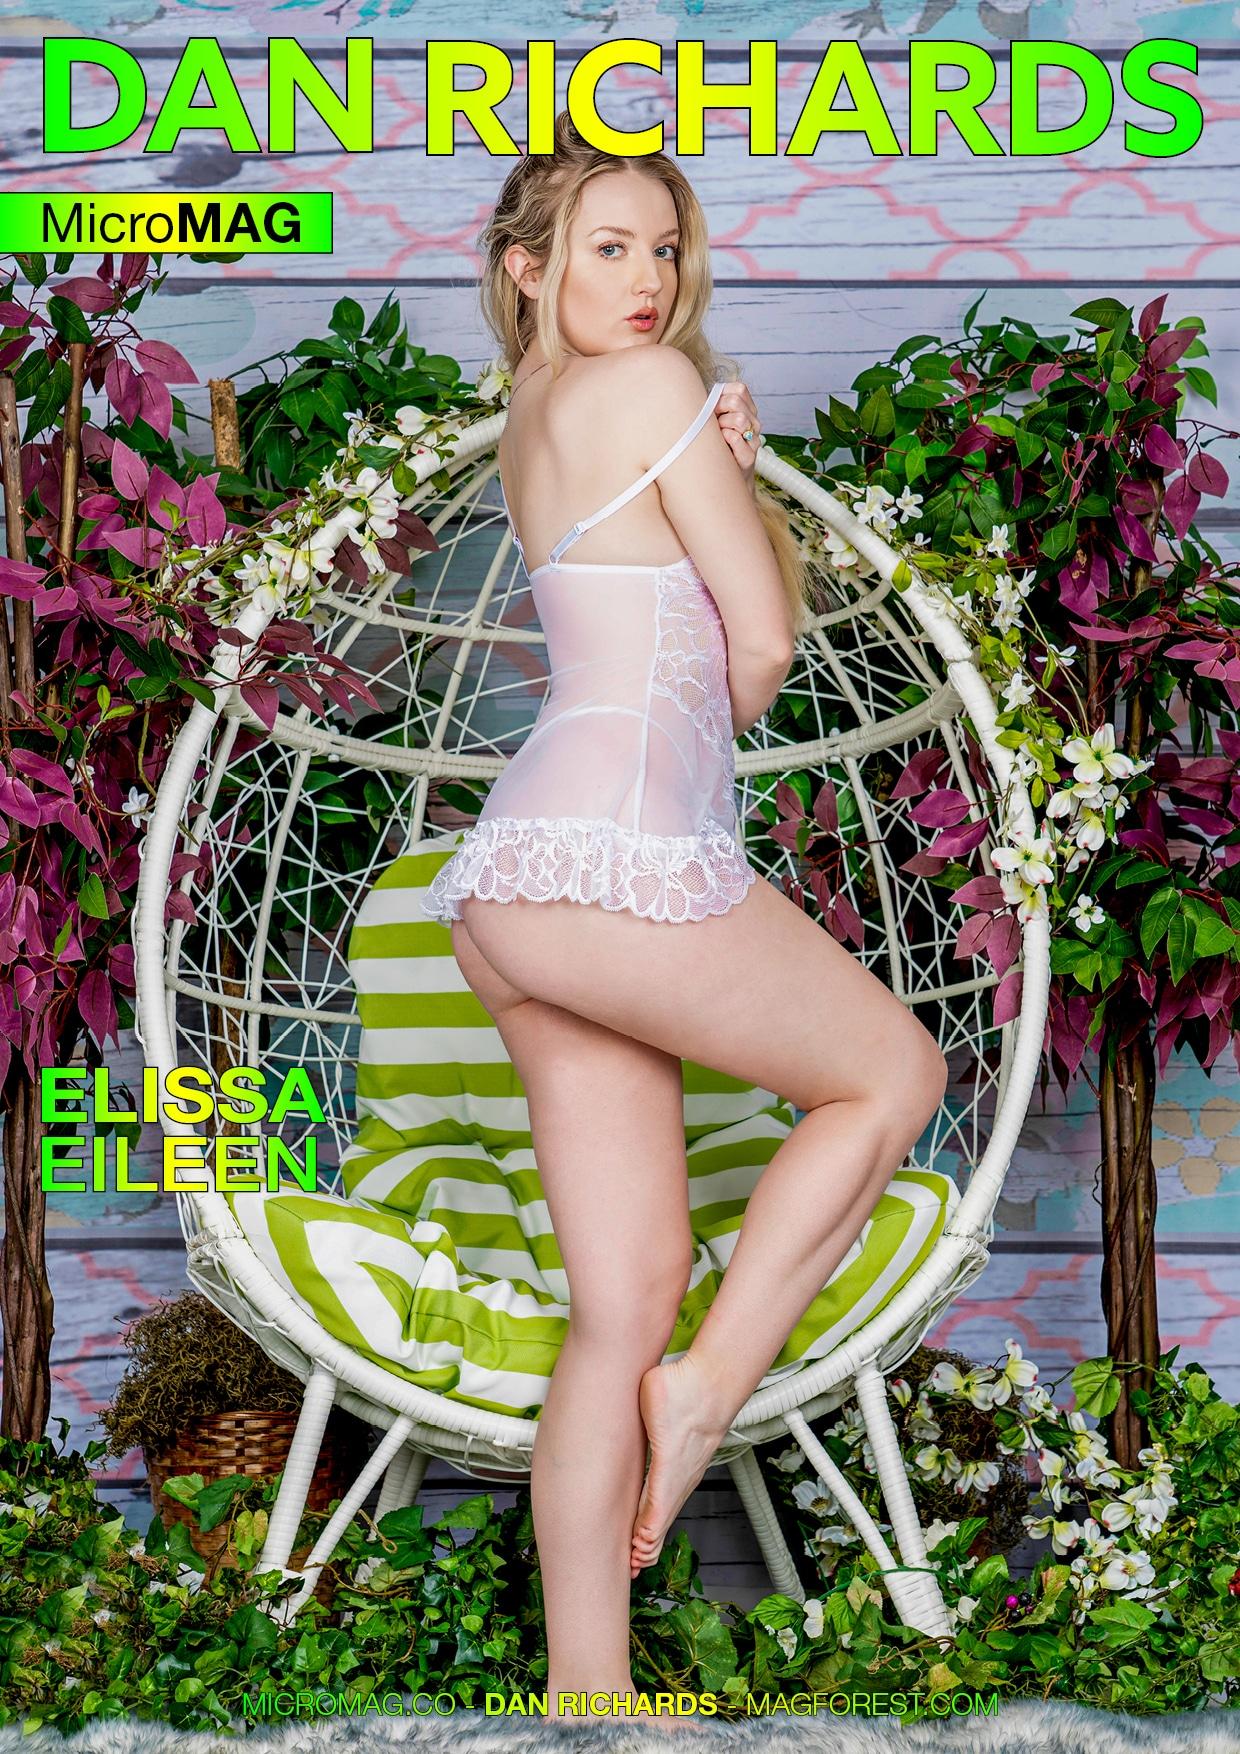 Dan Richards MicroMAG - Elissa Eileen 1